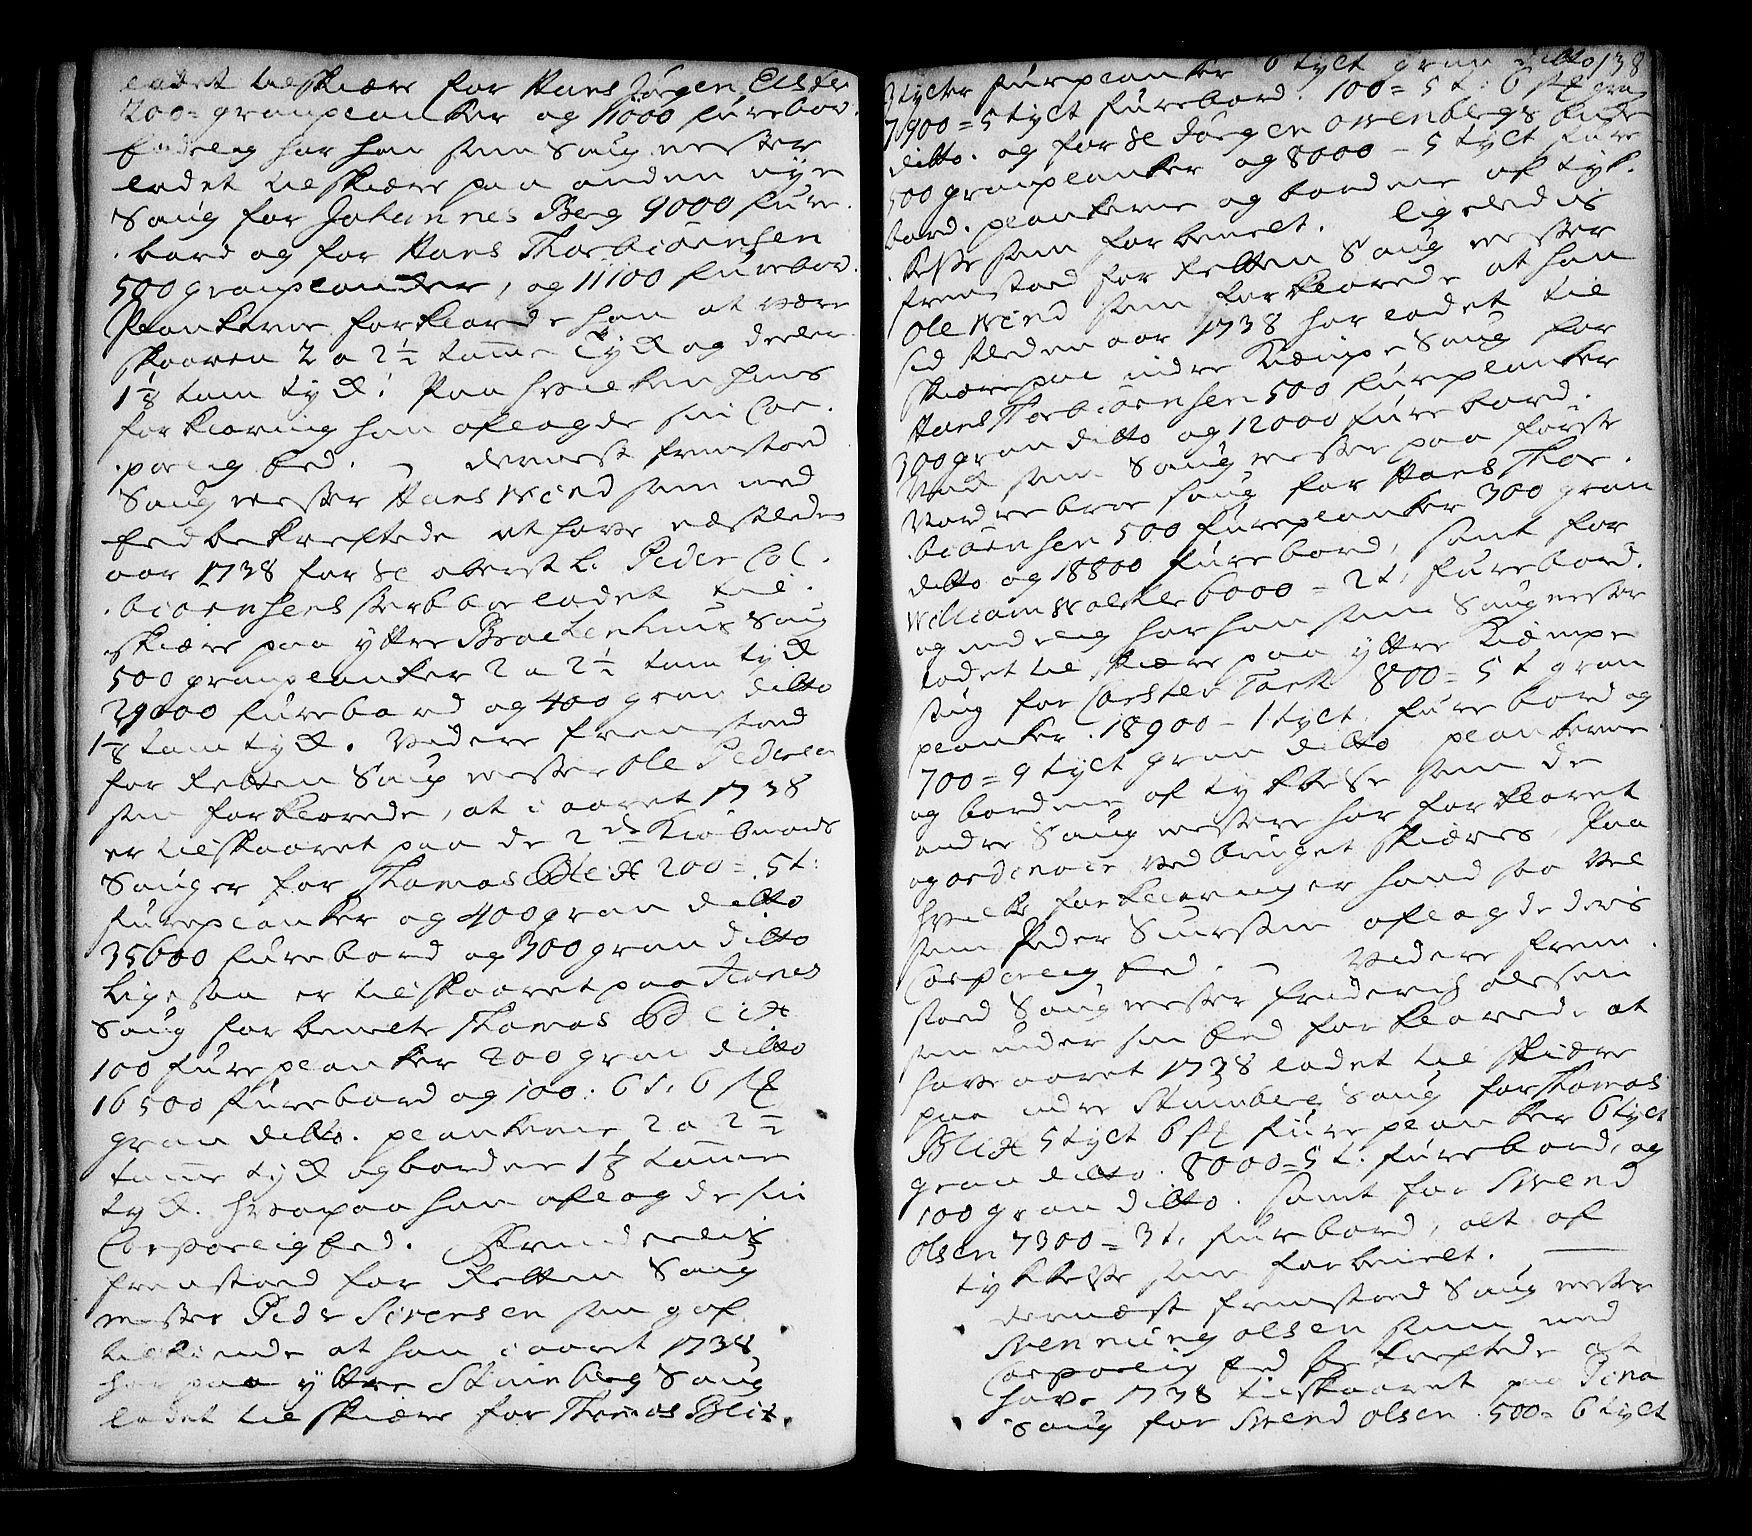 SAO, Halden byfogd, F/Fb/L0008: Tingbok, 1736-1745, s. 137b-138a